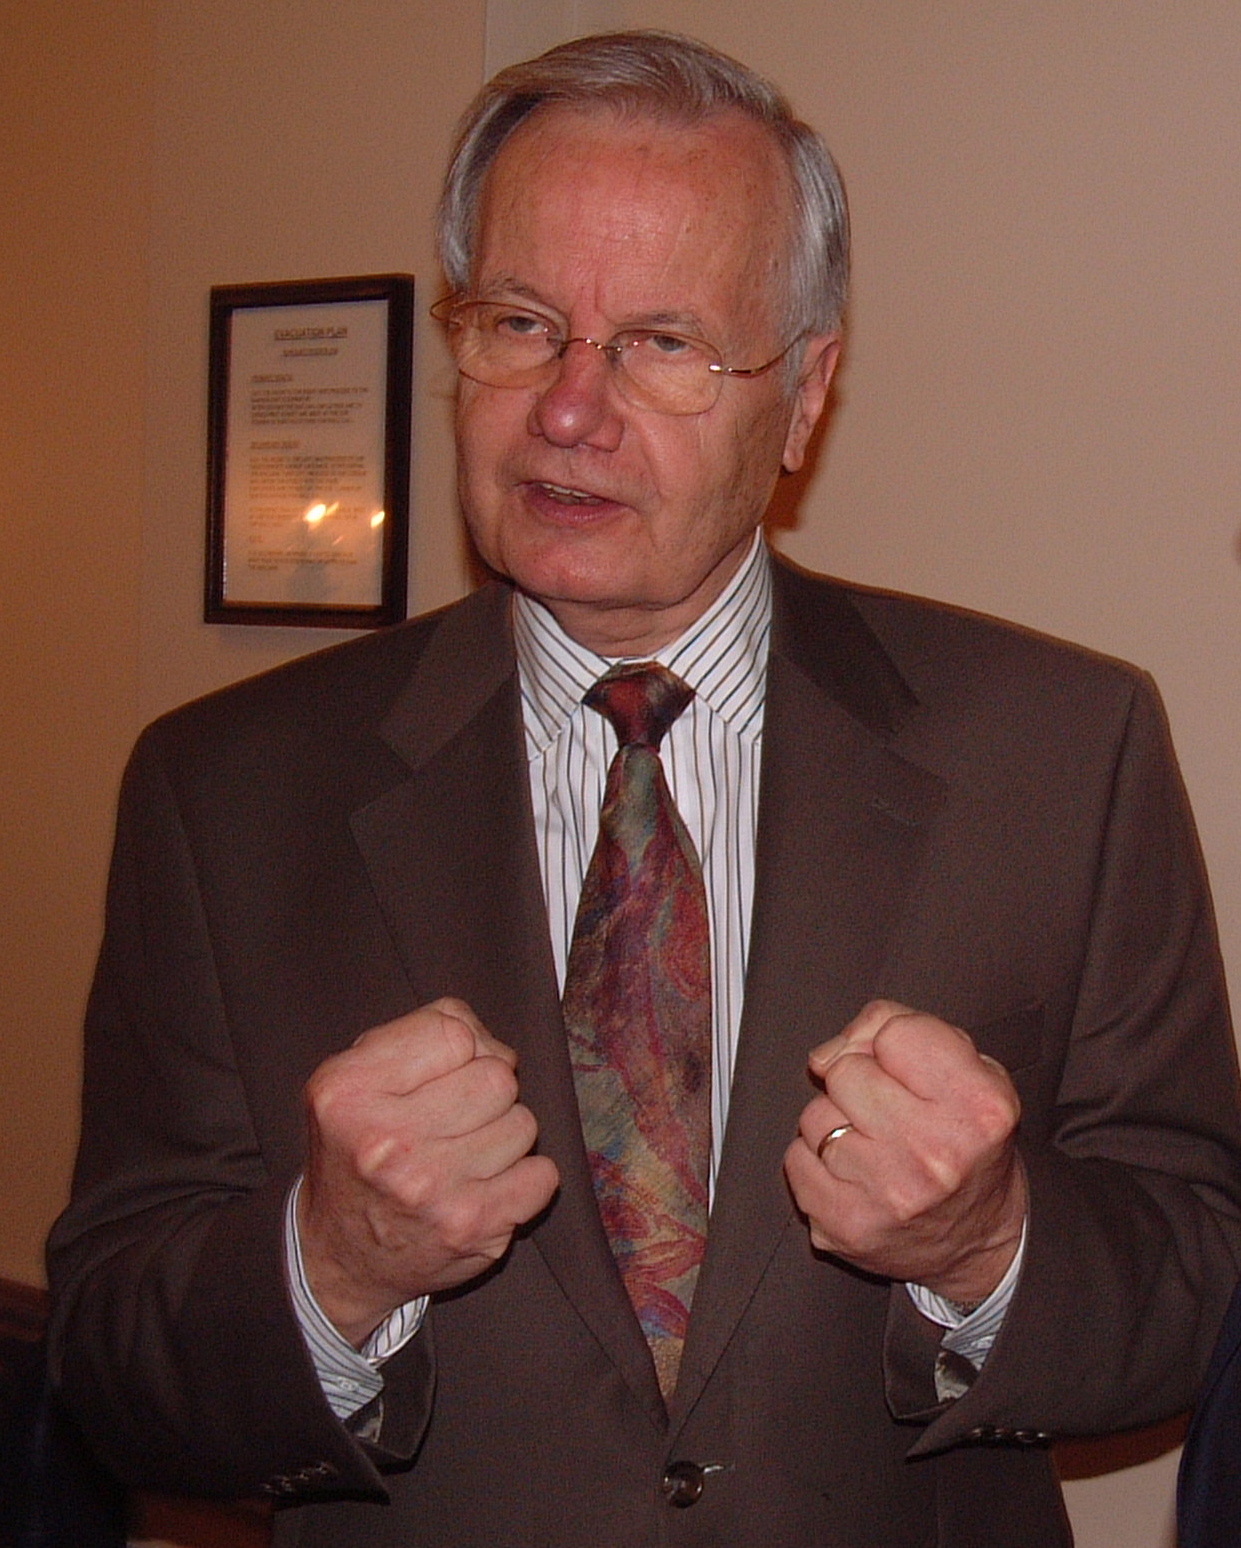 Bill_Moyers_24_May_2005